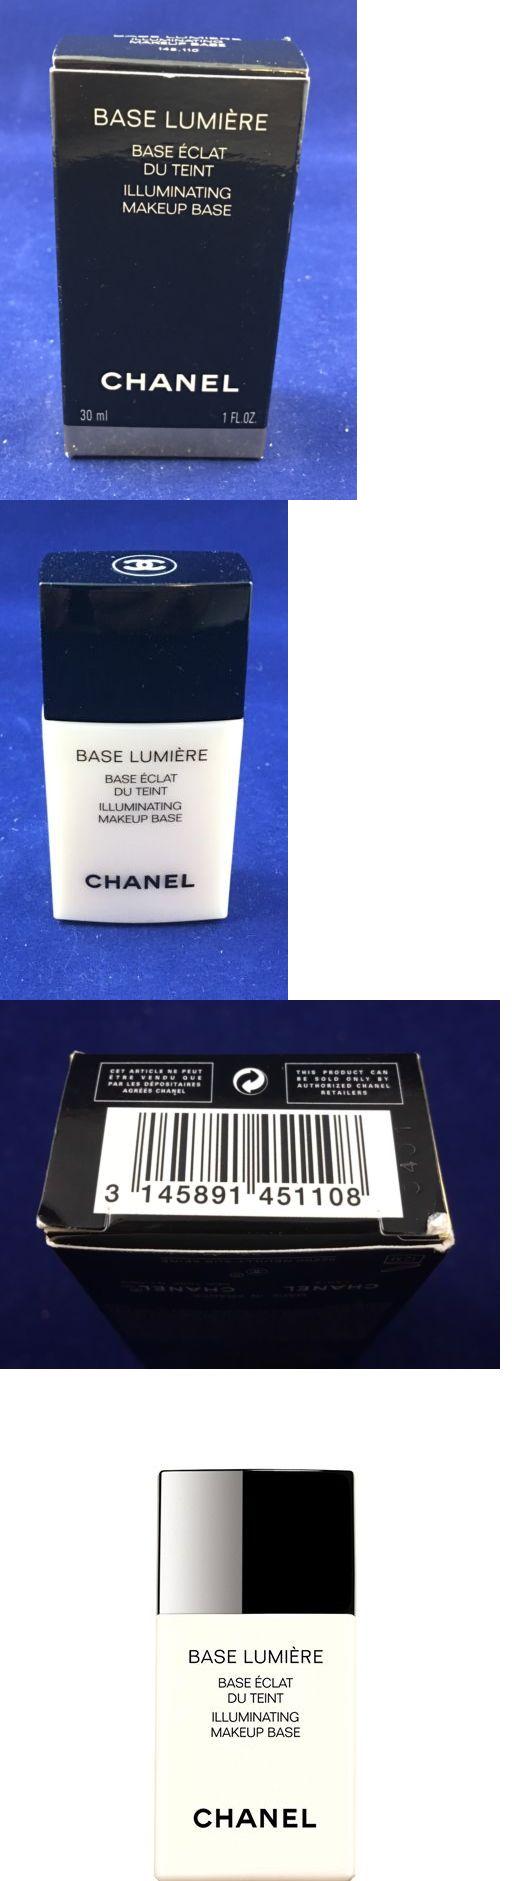 Foundation Primer: Chanel Base Lumiere Illuminating Makeup Base 30Ml 1Oz Nib 100% Authentic -> BUY IT NOW ONLY: $35.99 on eBay!